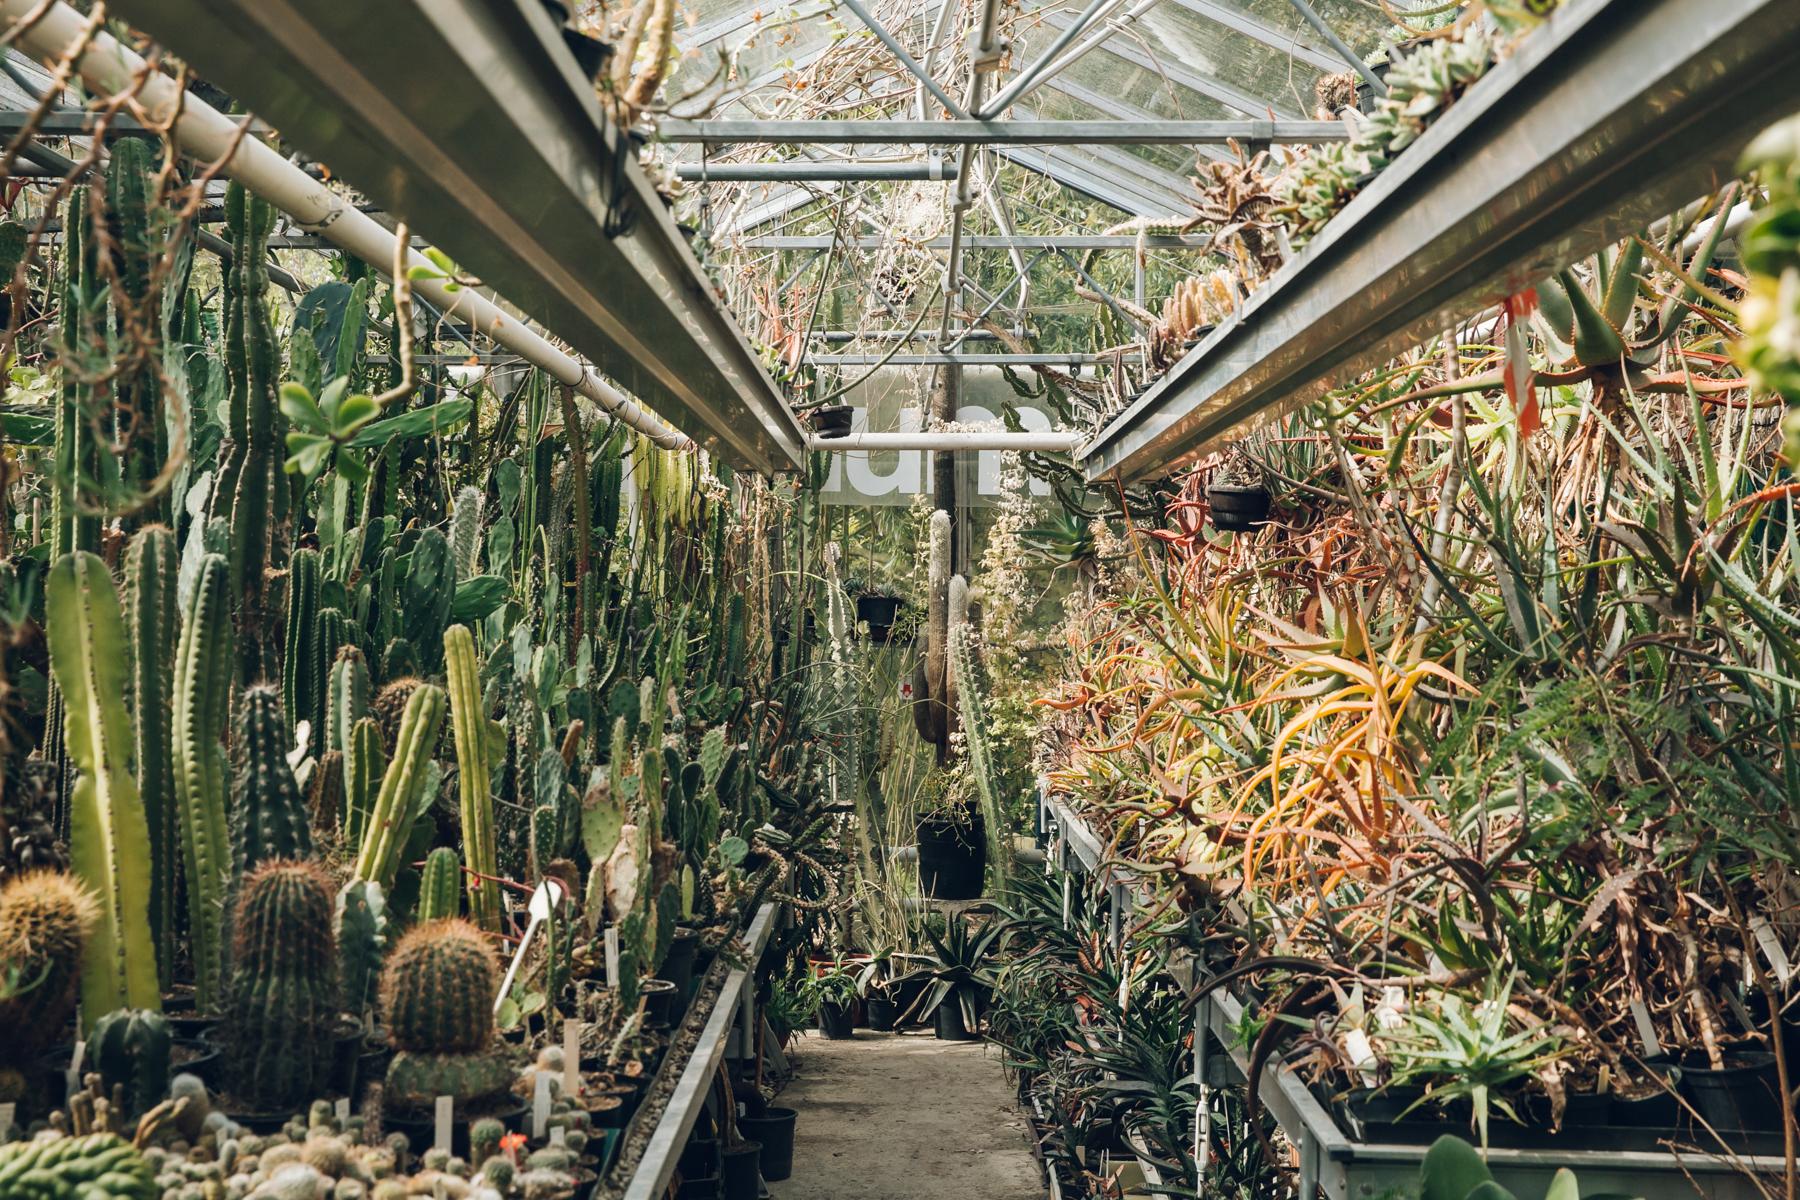 Cacti inside the glasshouses at Botanische Tuin Zuidas in Amsterdam.